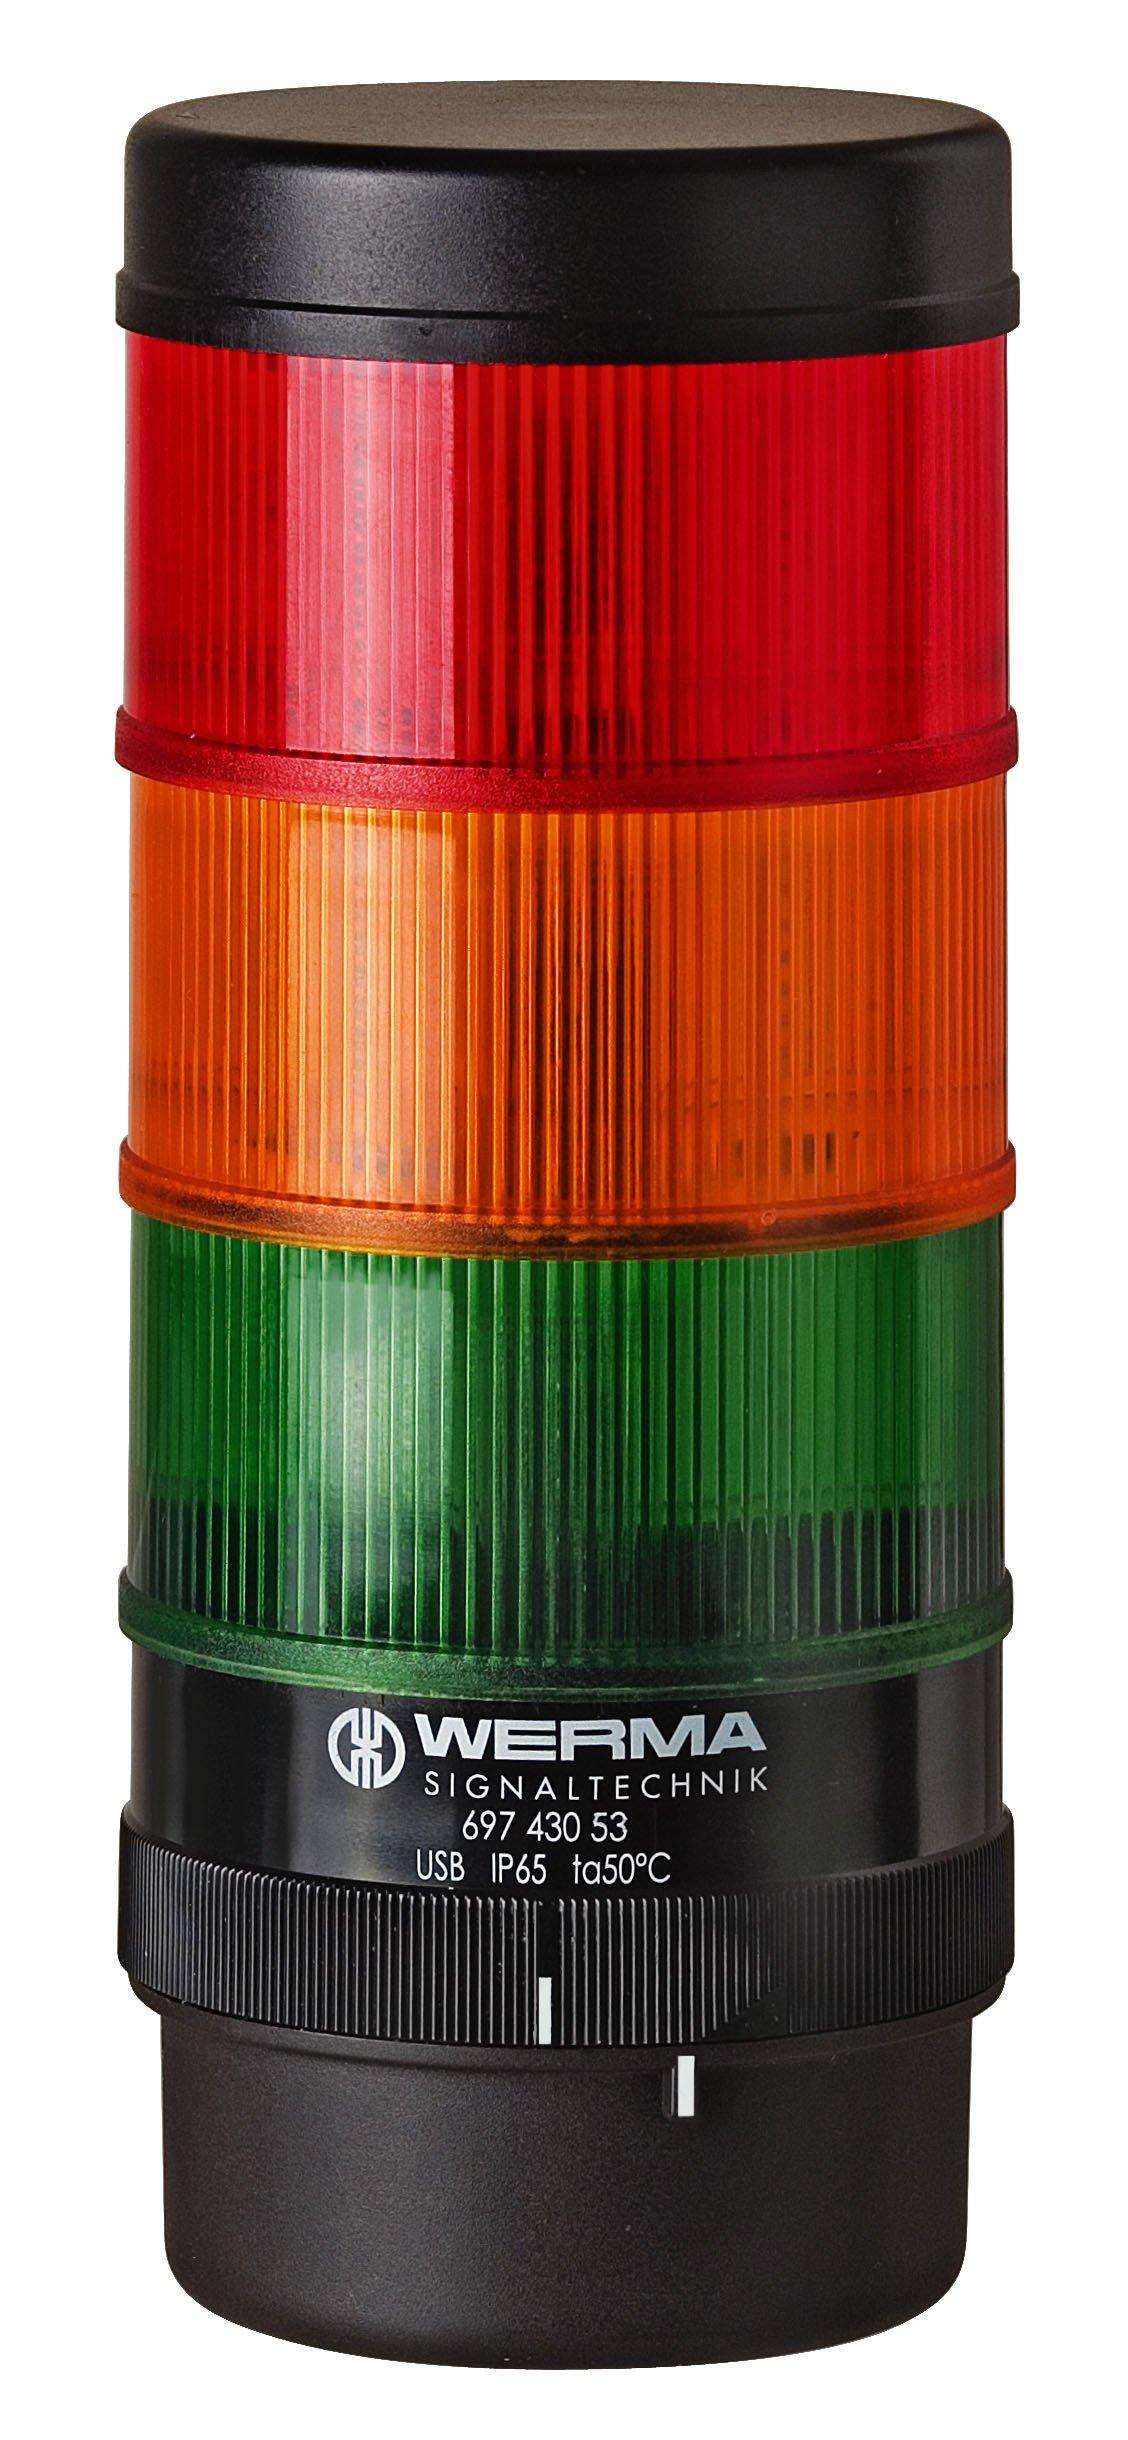 WERMA 697.000.55 Kompakt 71 BWM, 24 VDC, Pa-gf, Green/Yellow/Red